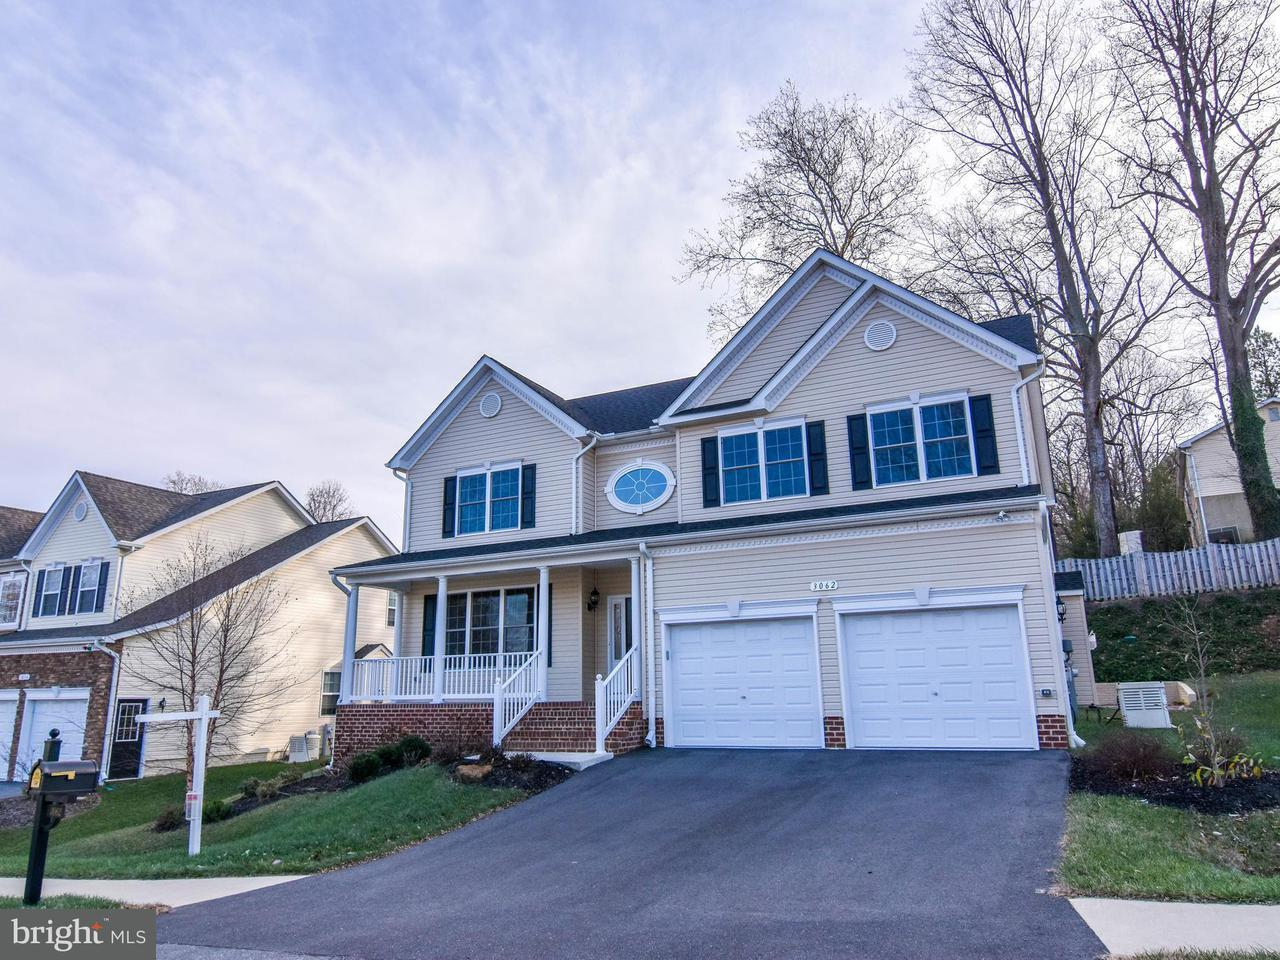 Casa Unifamiliar por un Venta en 3062 LAWRIN Court 3062 LAWRIN Court Chesapeake Beach, Maryland 20732 Estados Unidos